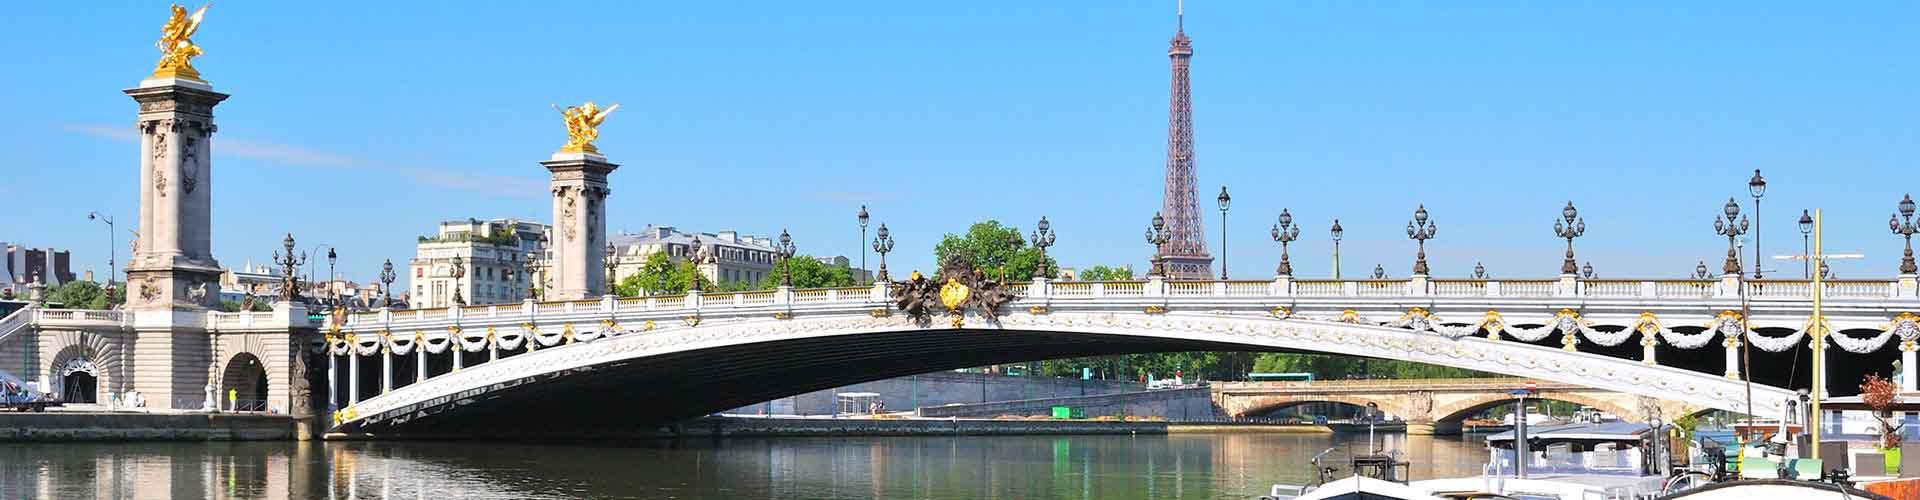 París - Hoteles baratos cerca a Pont Alexandre III. Mapas de París, Fotos y comentarios de cada Hotel en París.